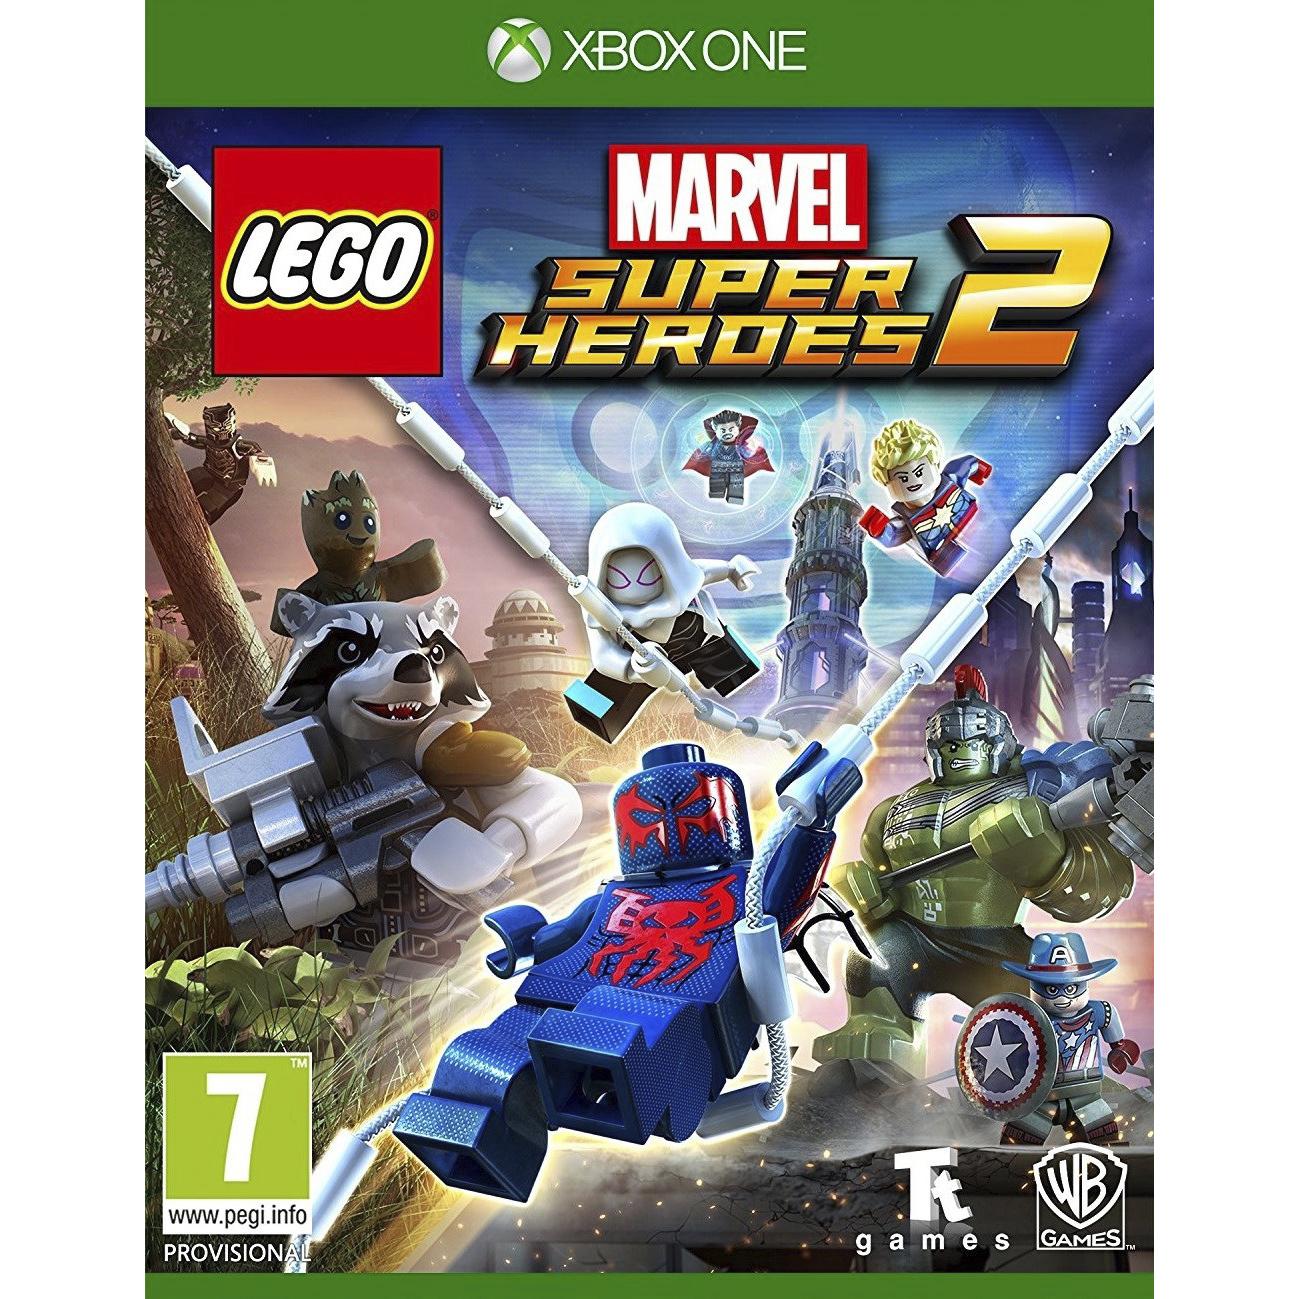 LEGO Marvel Super Heroes 2 (Arabic)